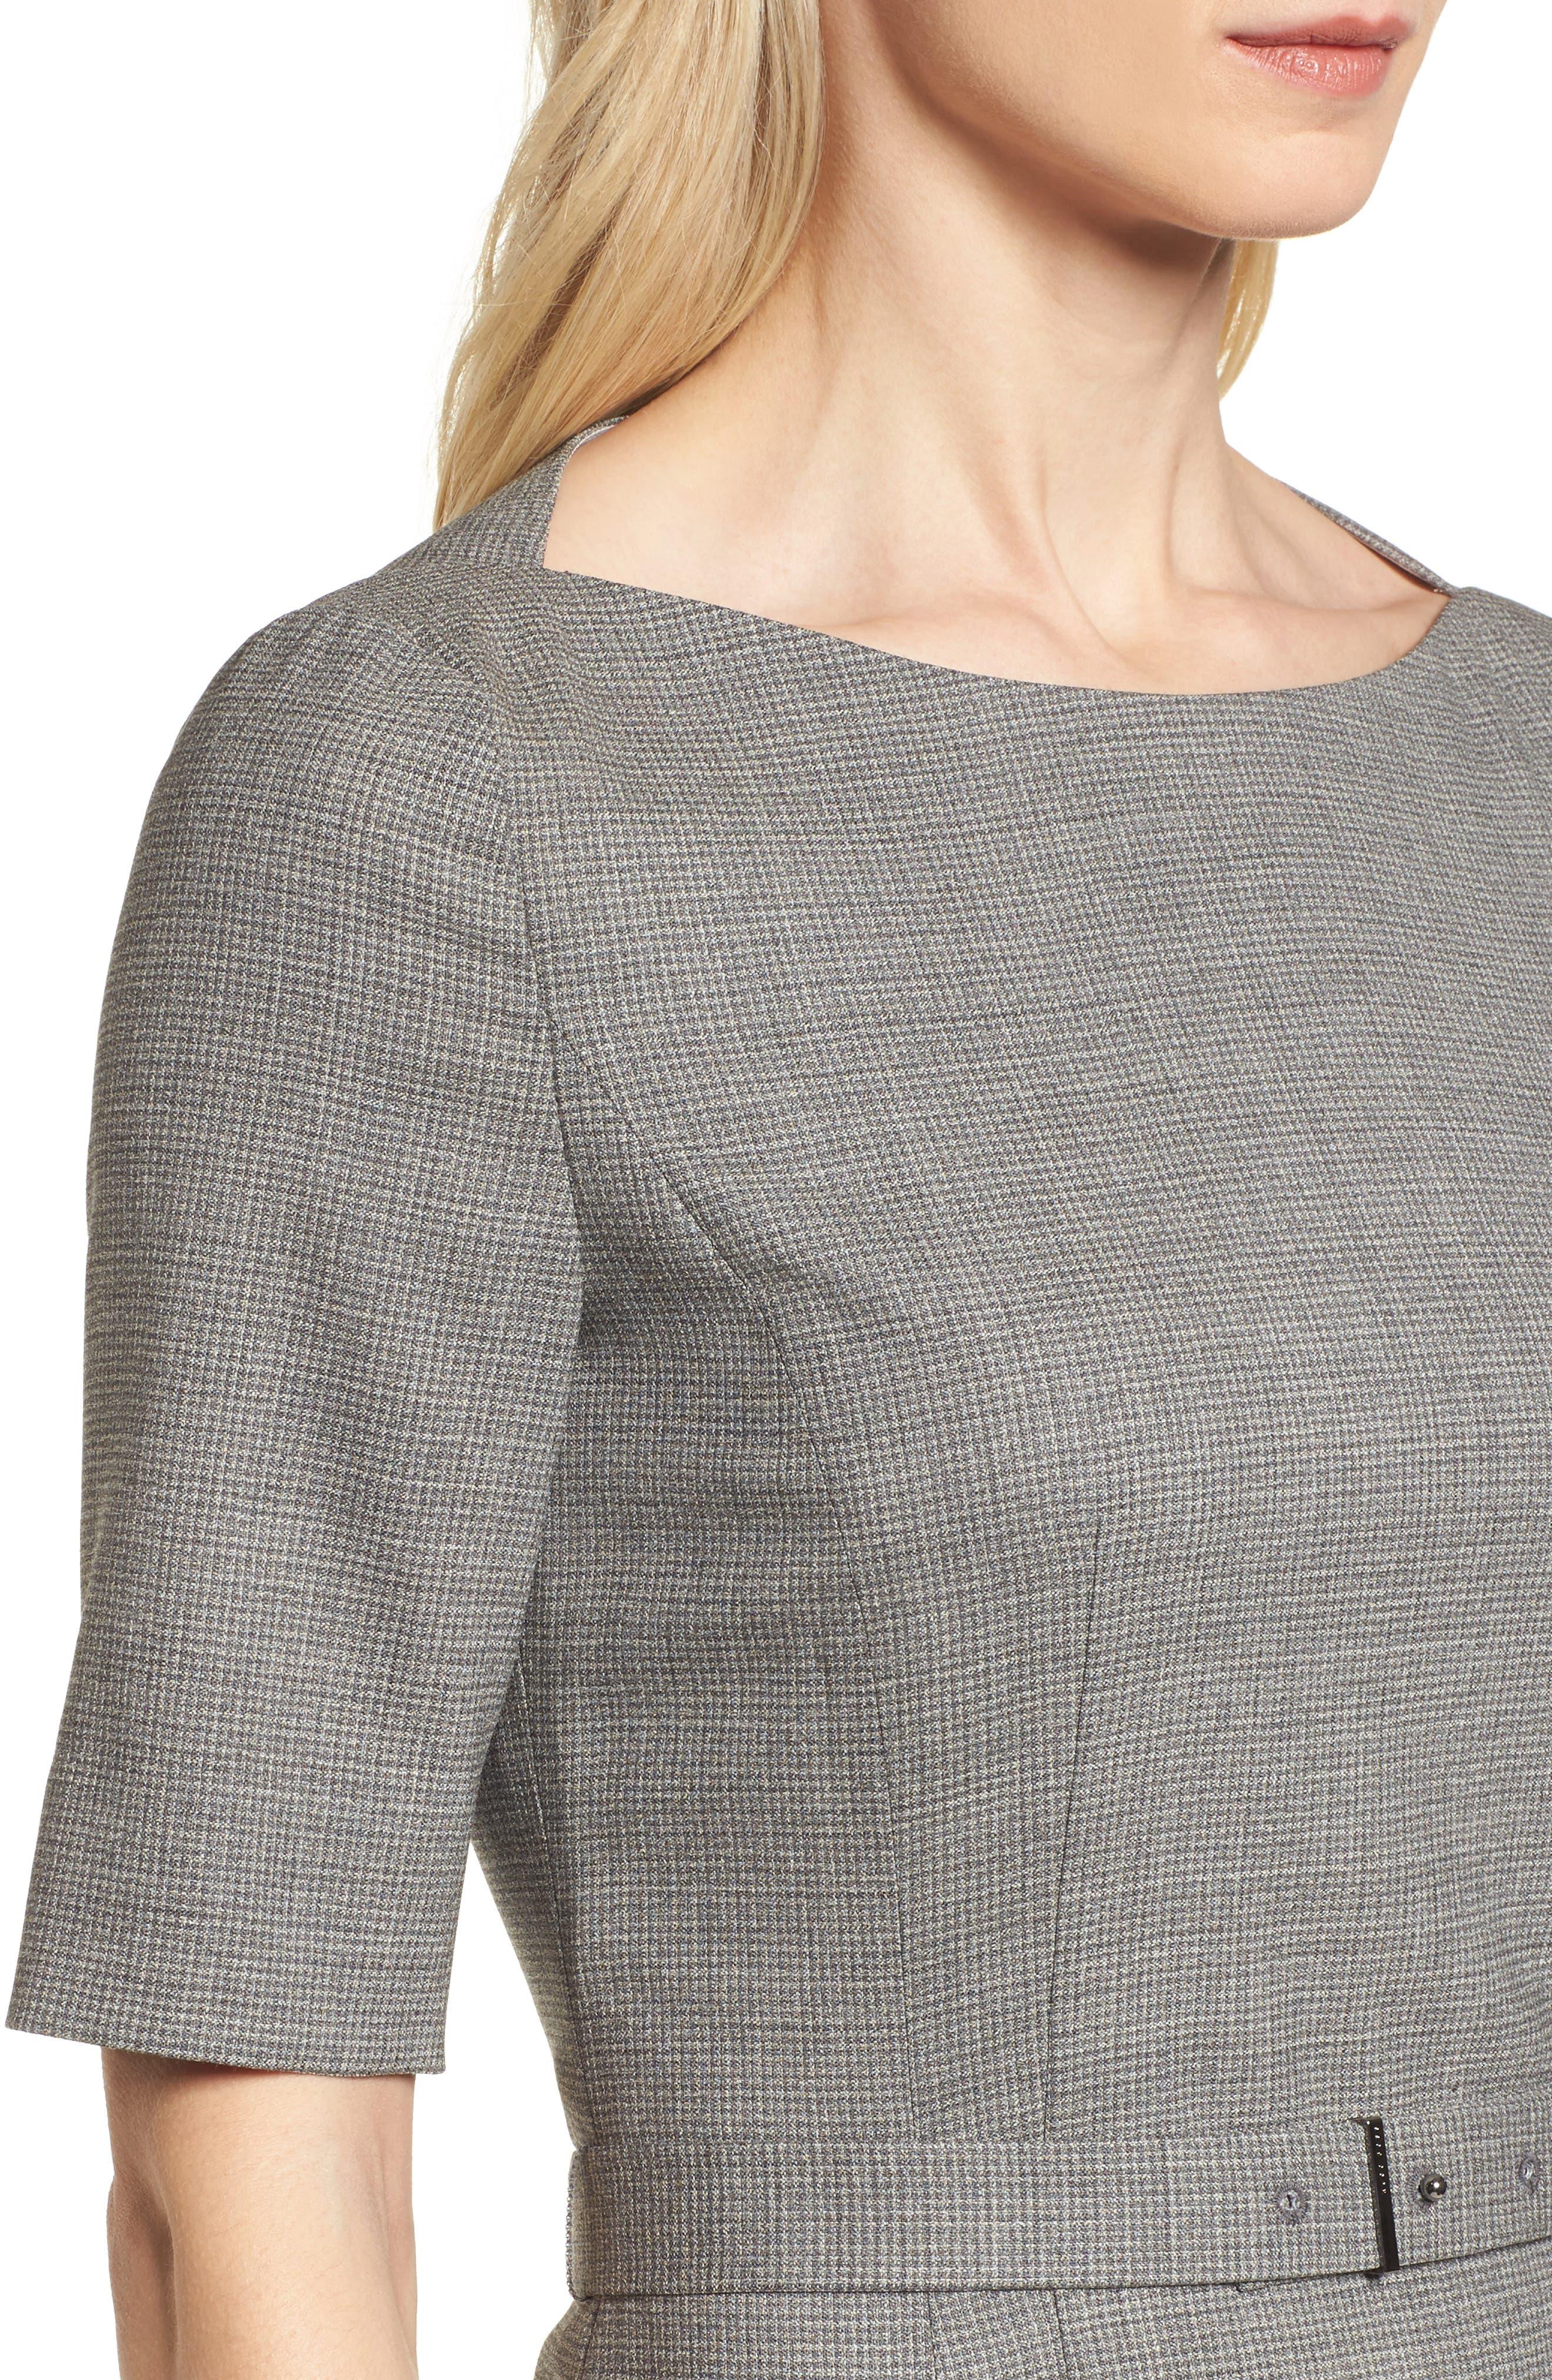 Dewisa Check Wool Sheath Dress,                             Alternate thumbnail 4, color,